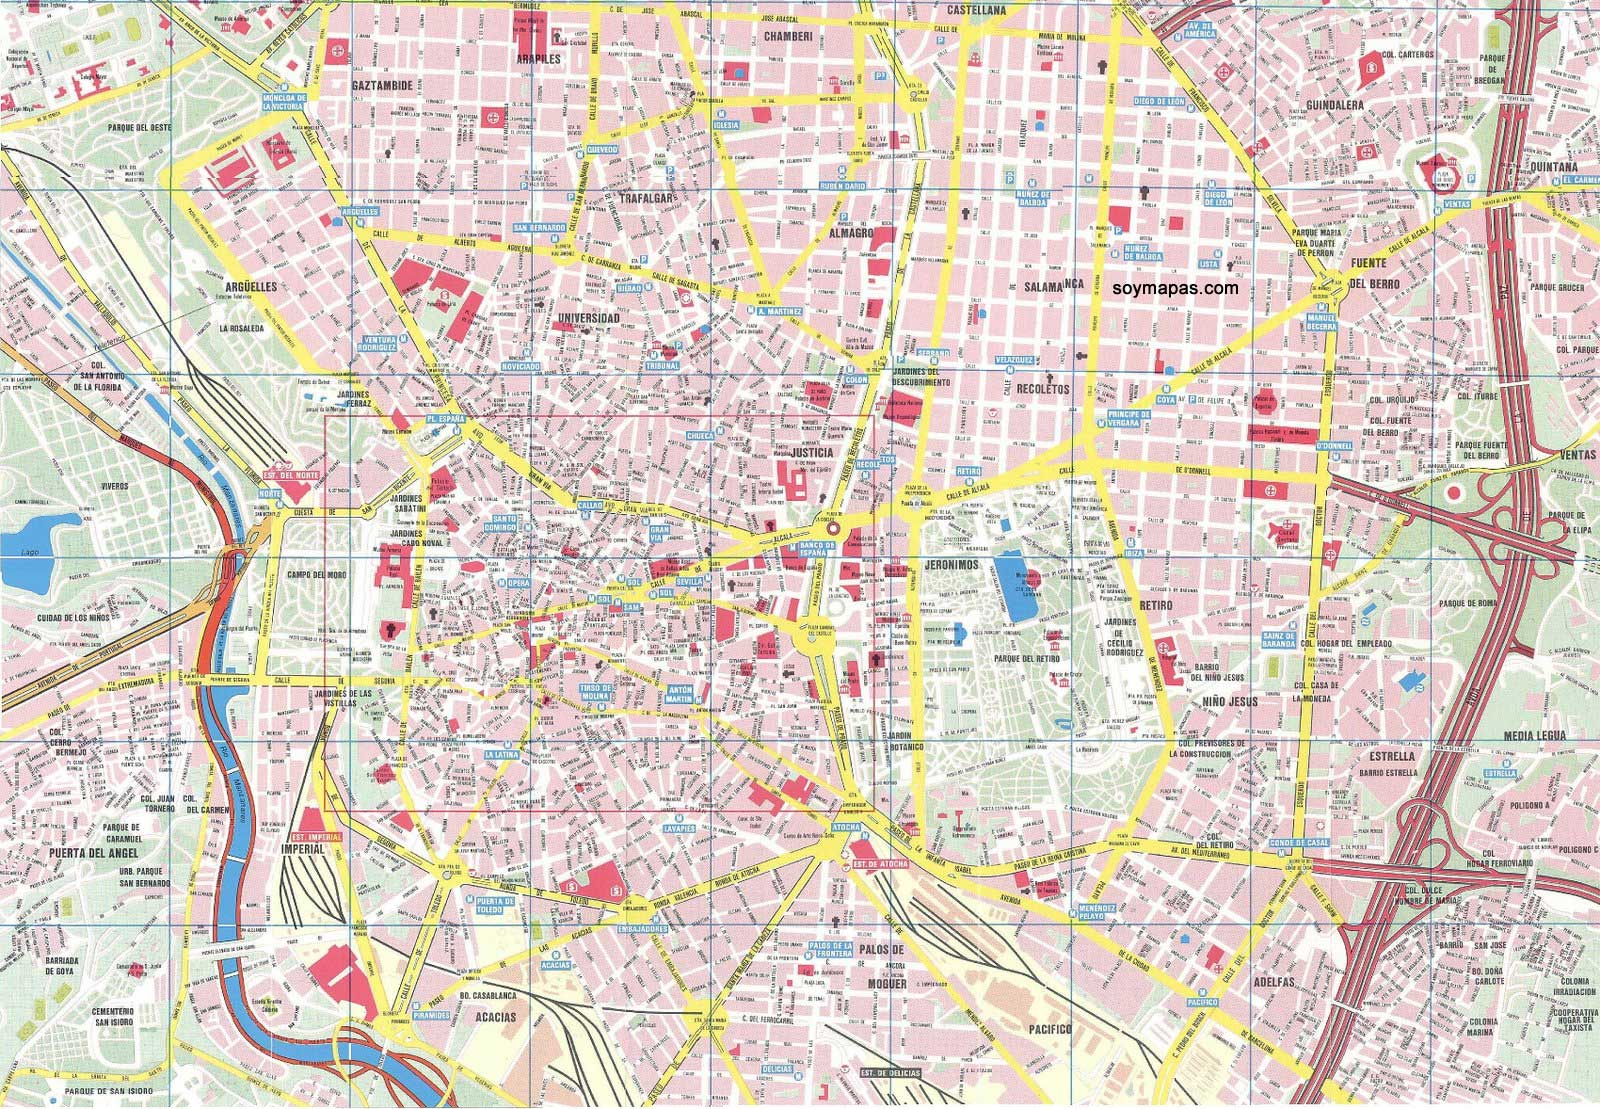 mapa-callejero-madrid